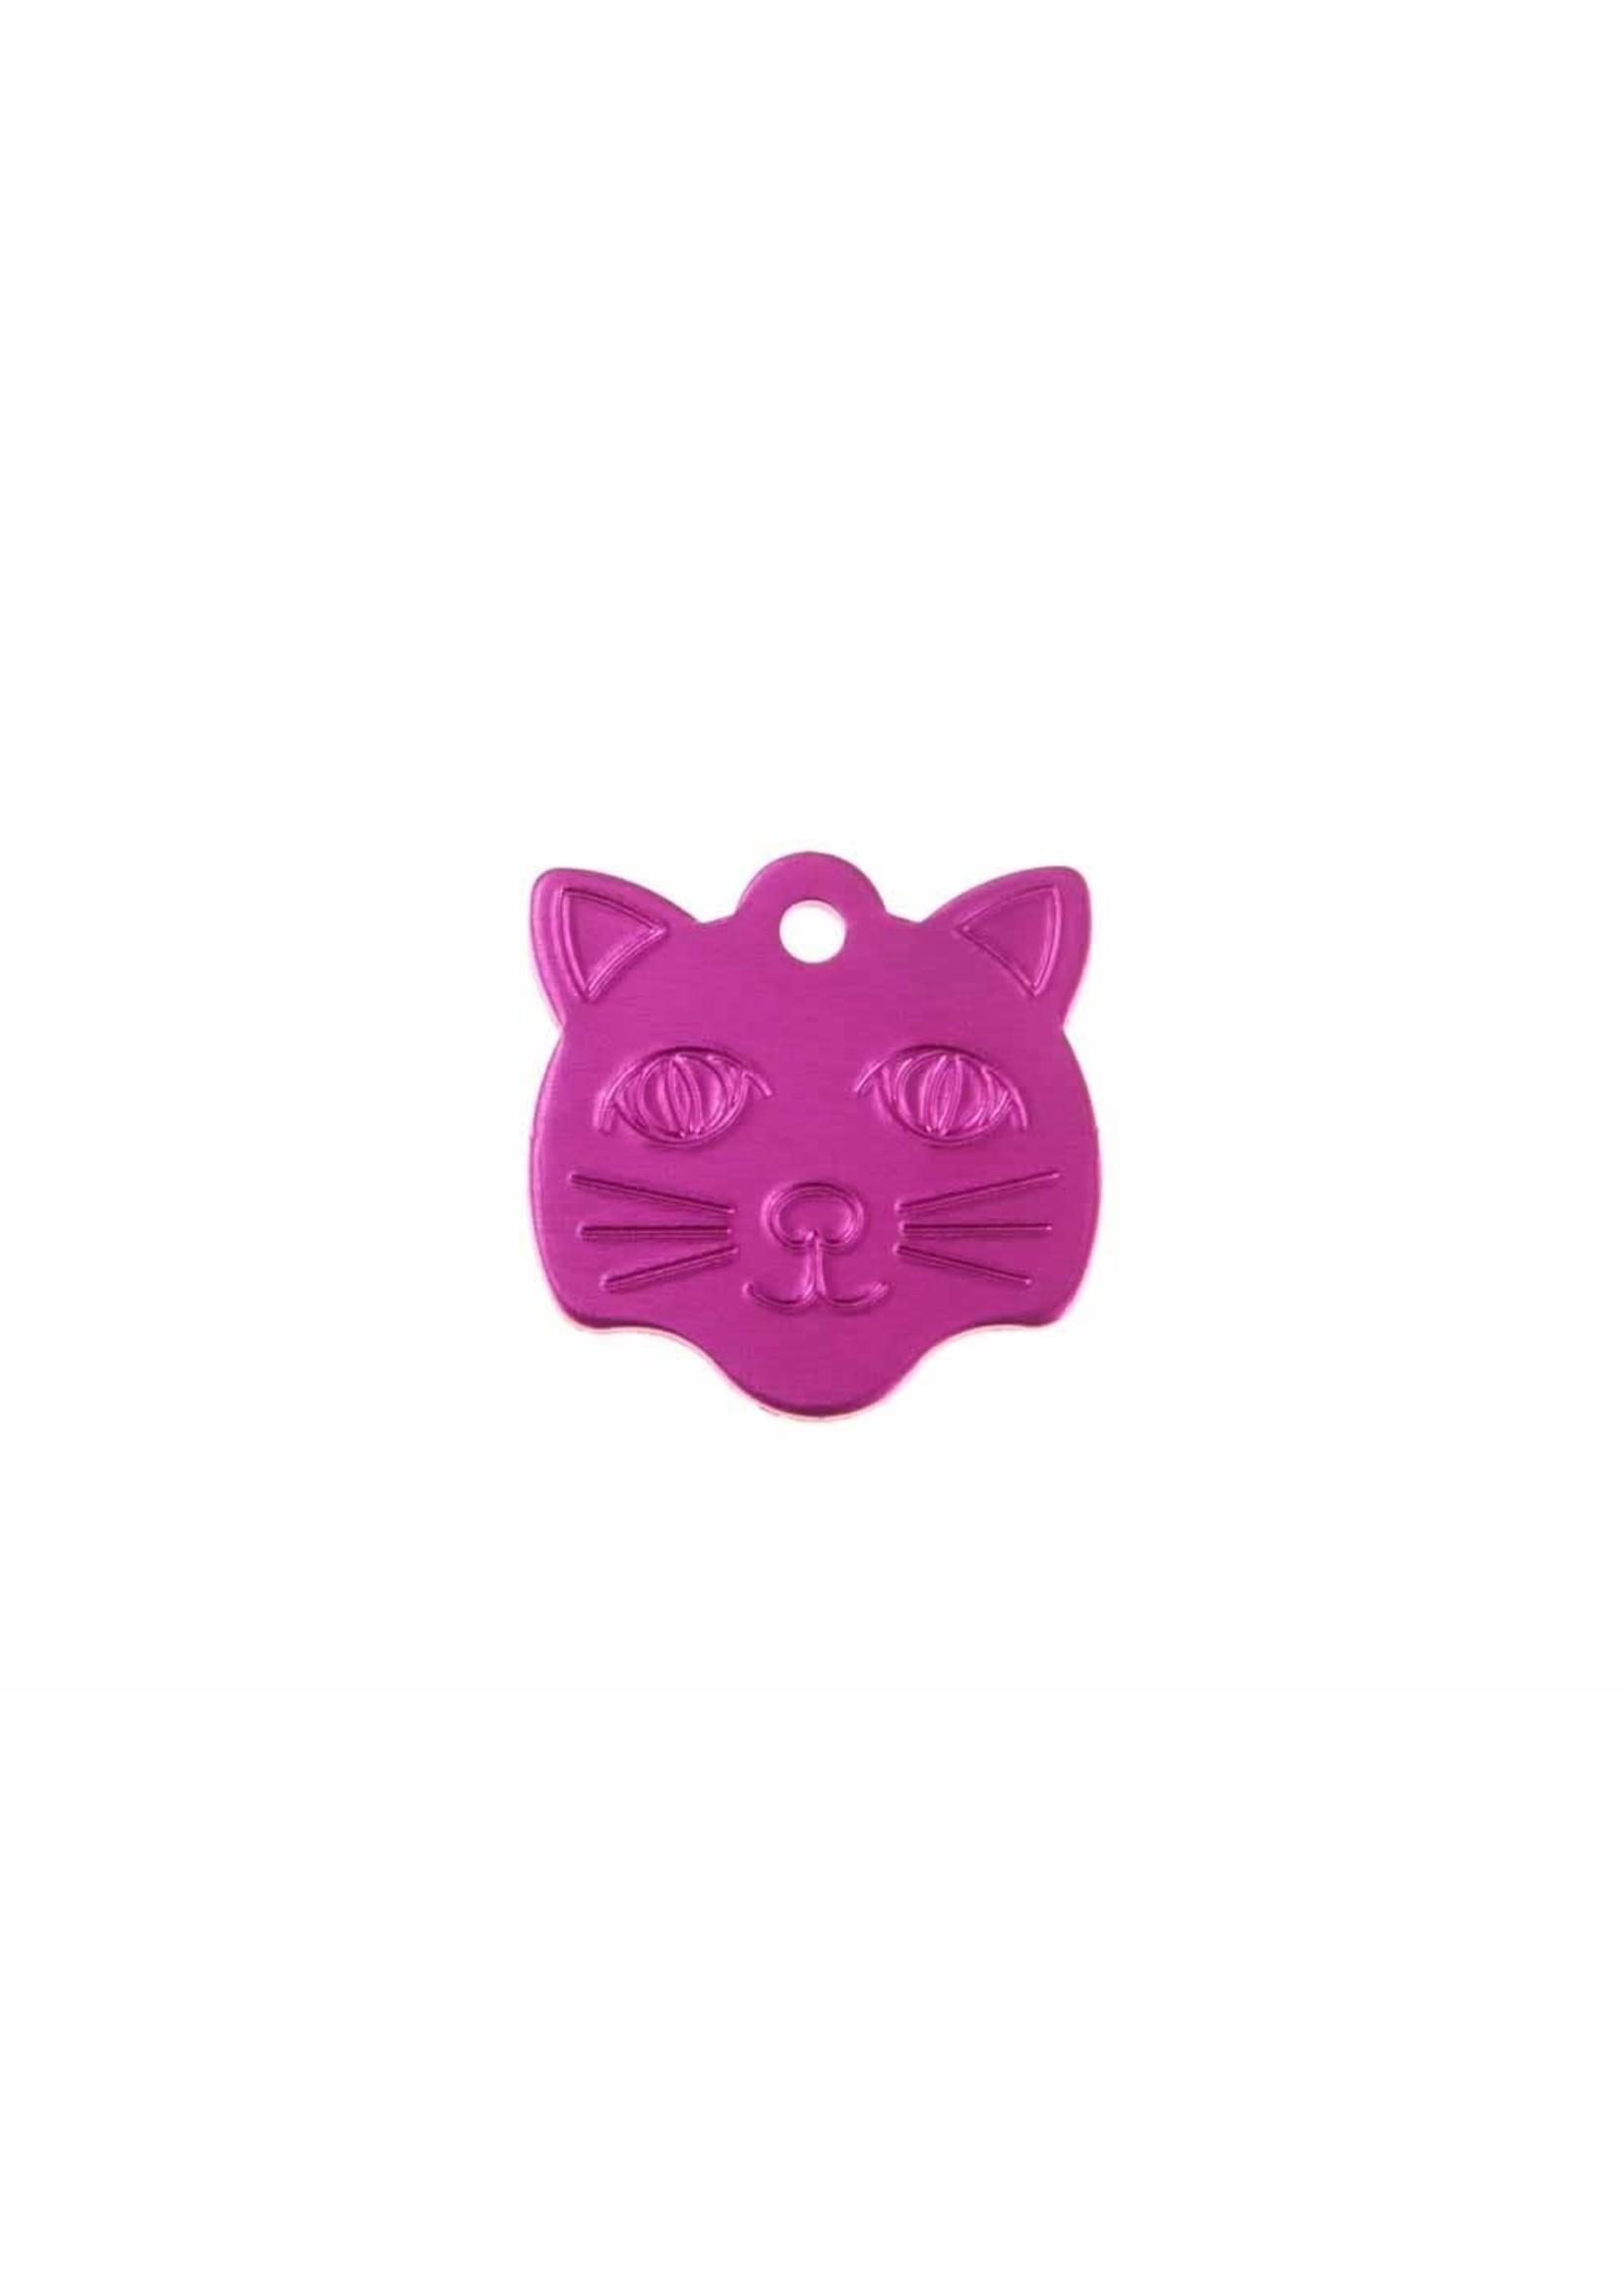 Cat Shape Pet Tag